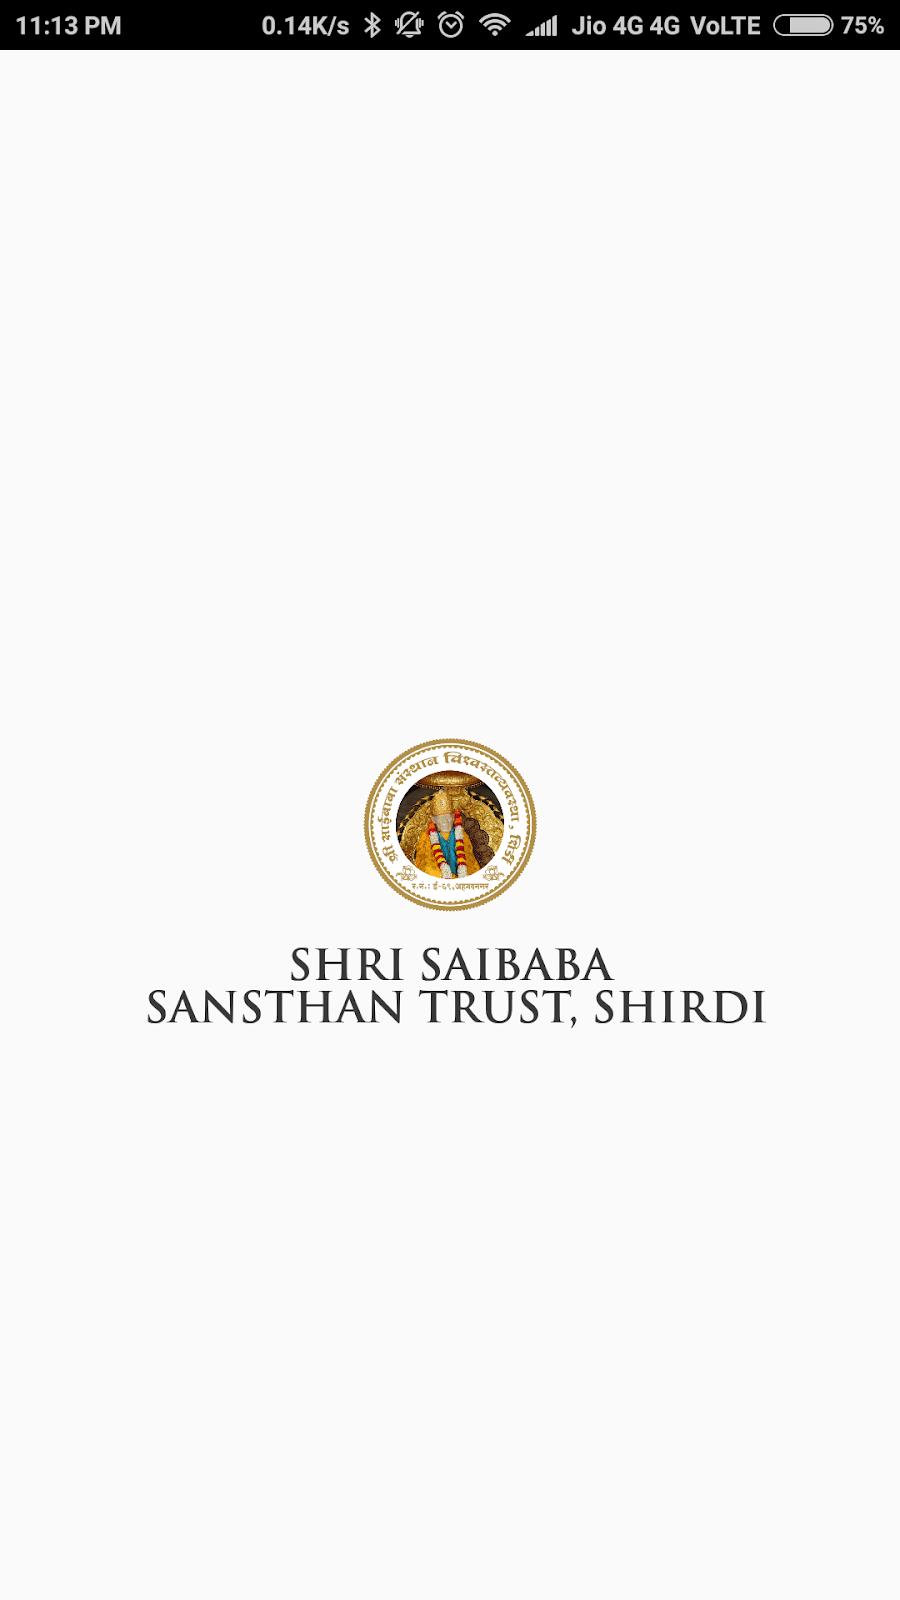 Good News - Shri Saibaba Sansthan Launches Mobile App